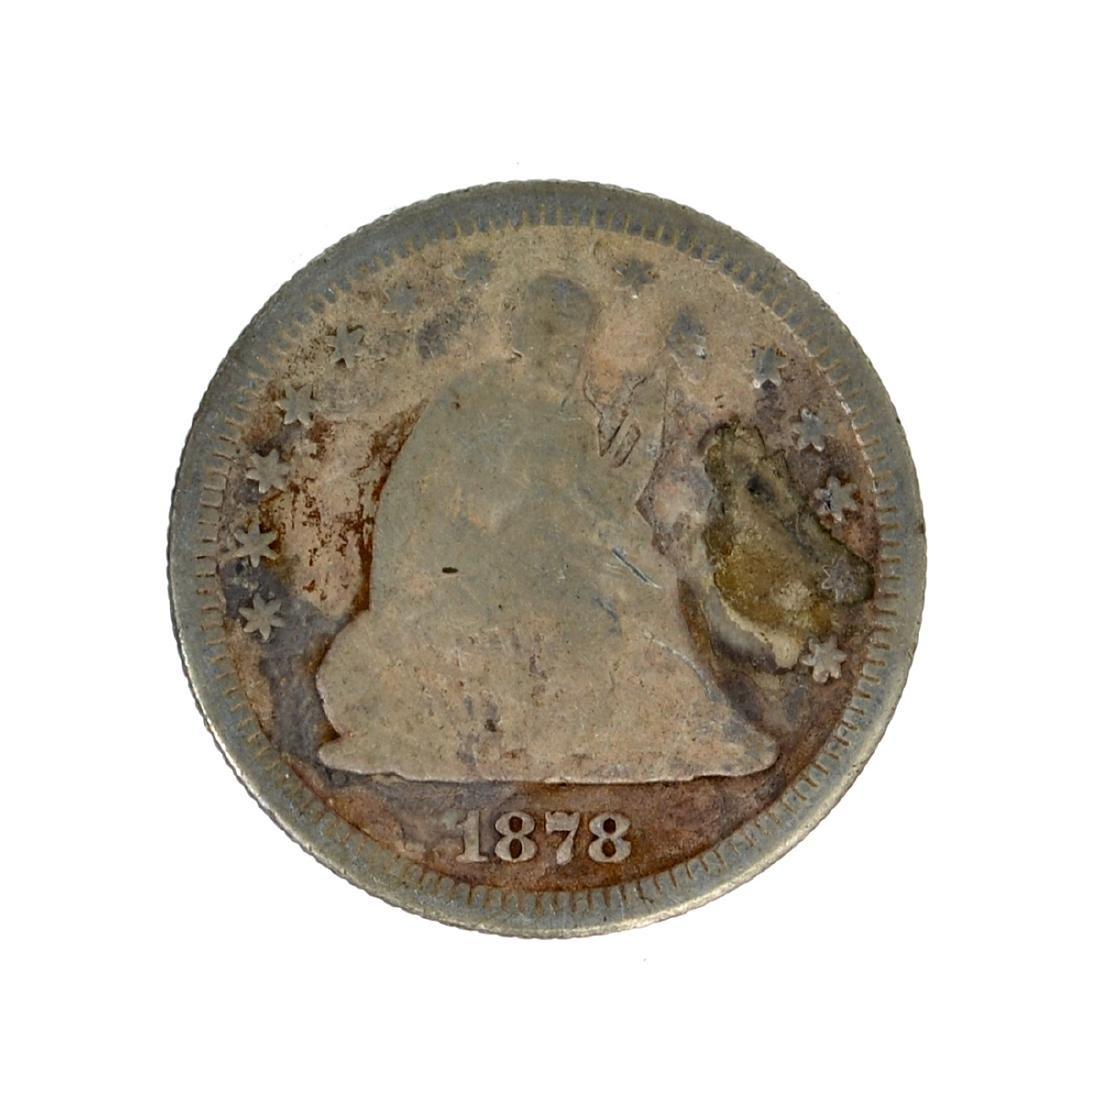 1878 Liberty Seated Quarter Dollar Coin